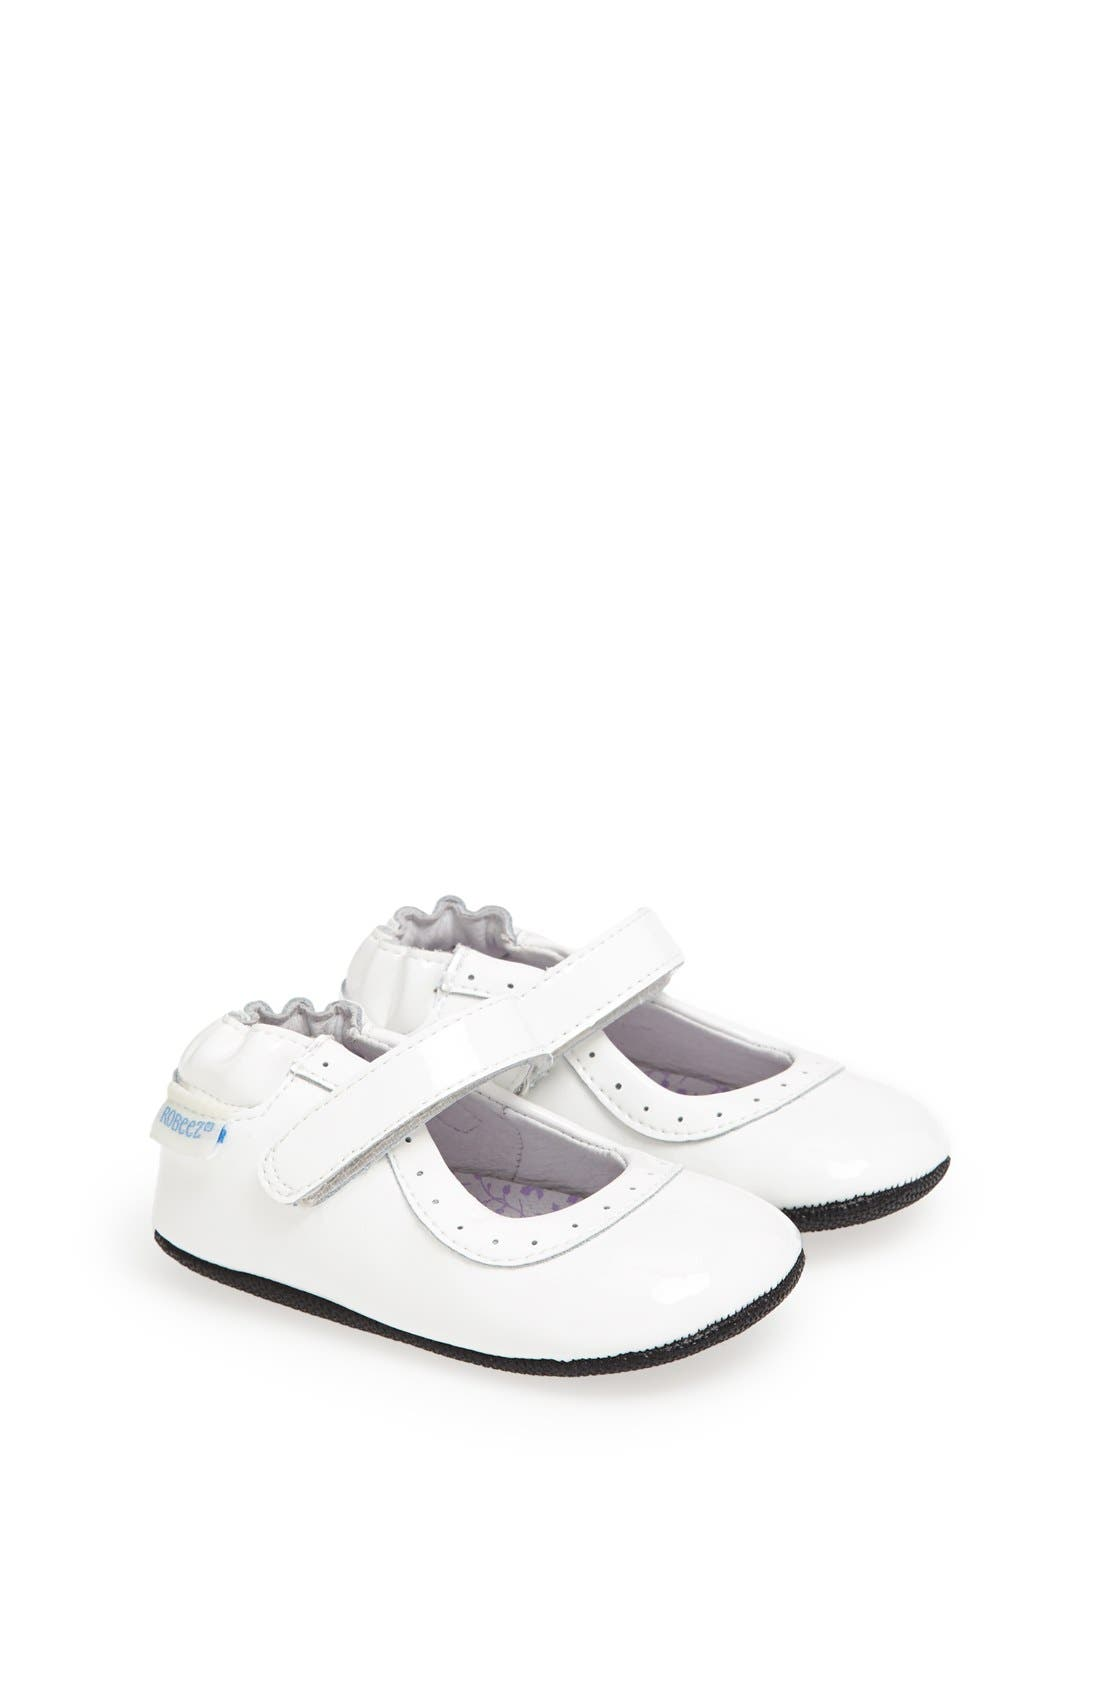 Alternate Image 1 Selected - Robeez® 'Mini Shoez - Gracie' Mary Jane (Baby & Walker)